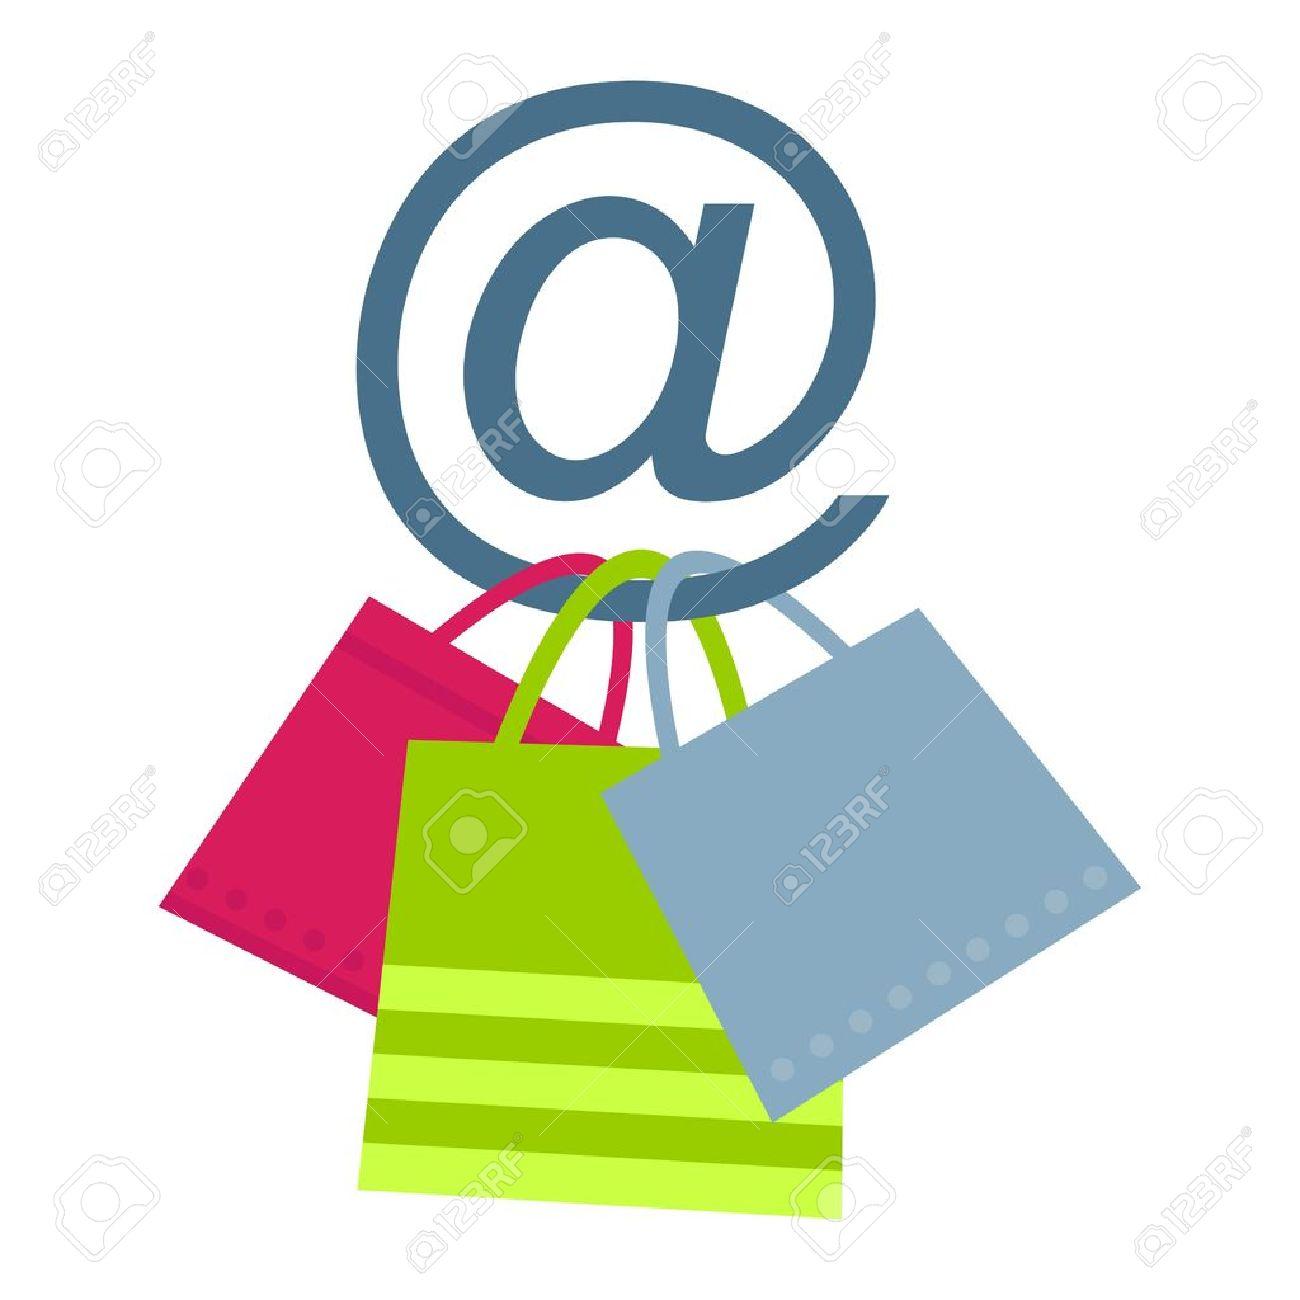 Online Shopping Secrets - Snap TV